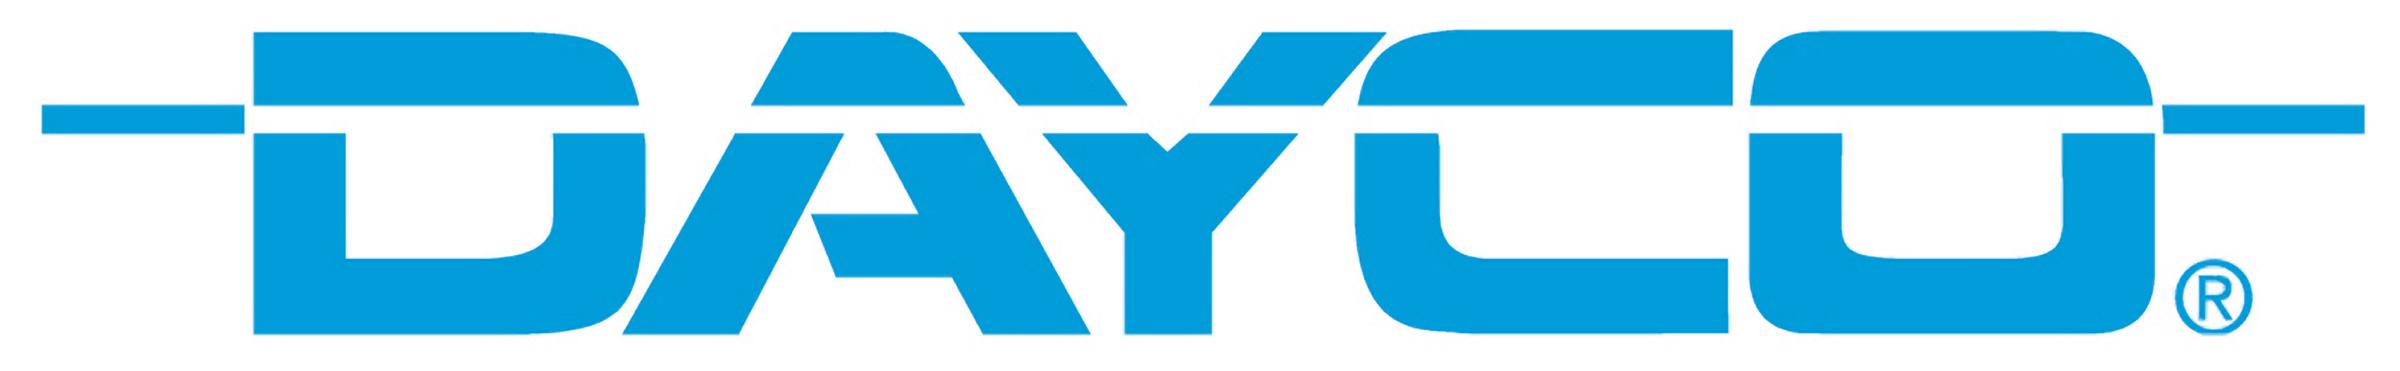 Dayco_Logo_27c0-by.jpg